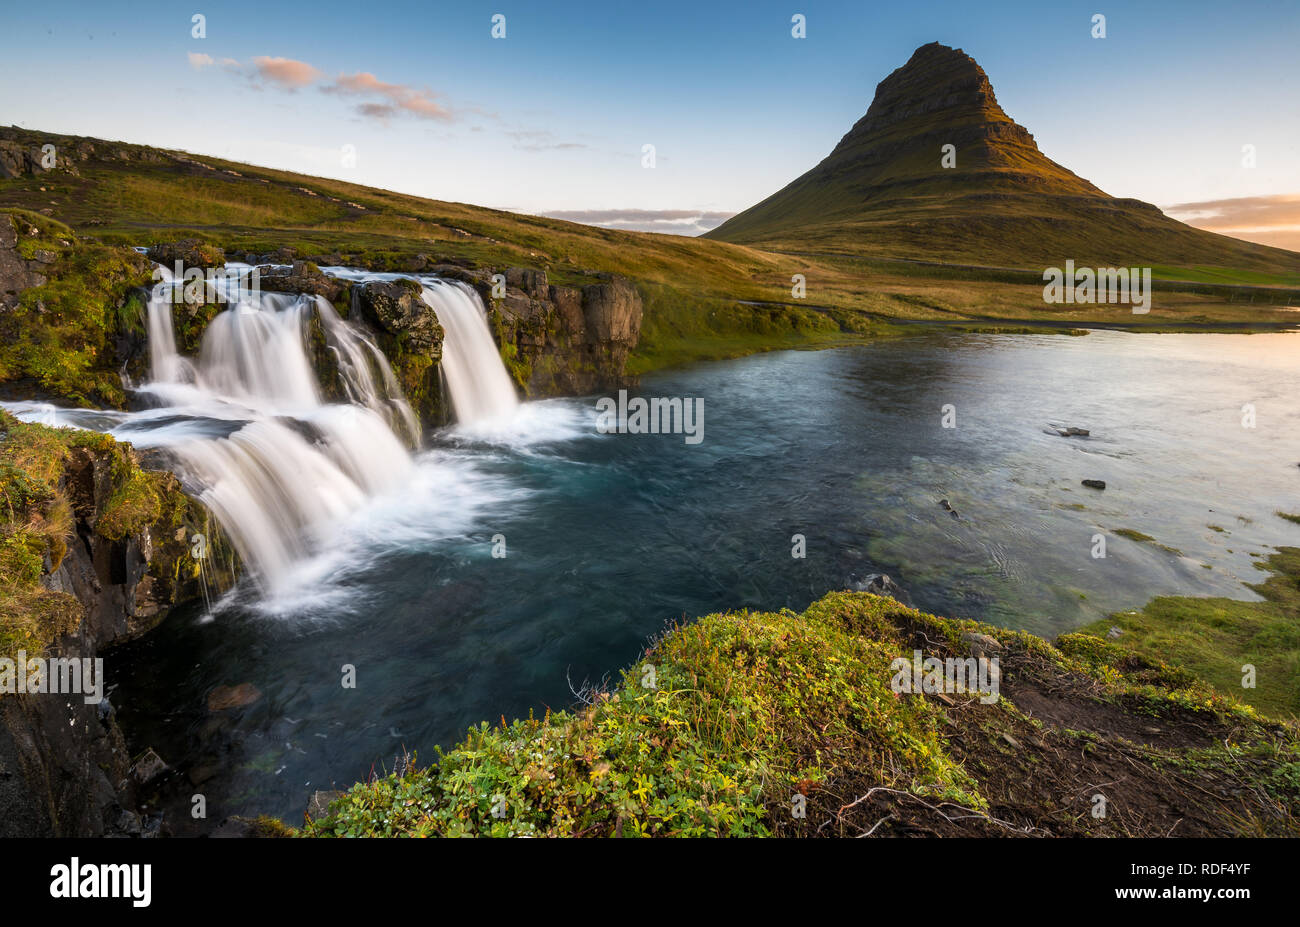 Berühmter Wasserfall des Kirkjufellsfoss bei Grundafjördur auf der Snaefellsnes Halbinsel - Stock Image